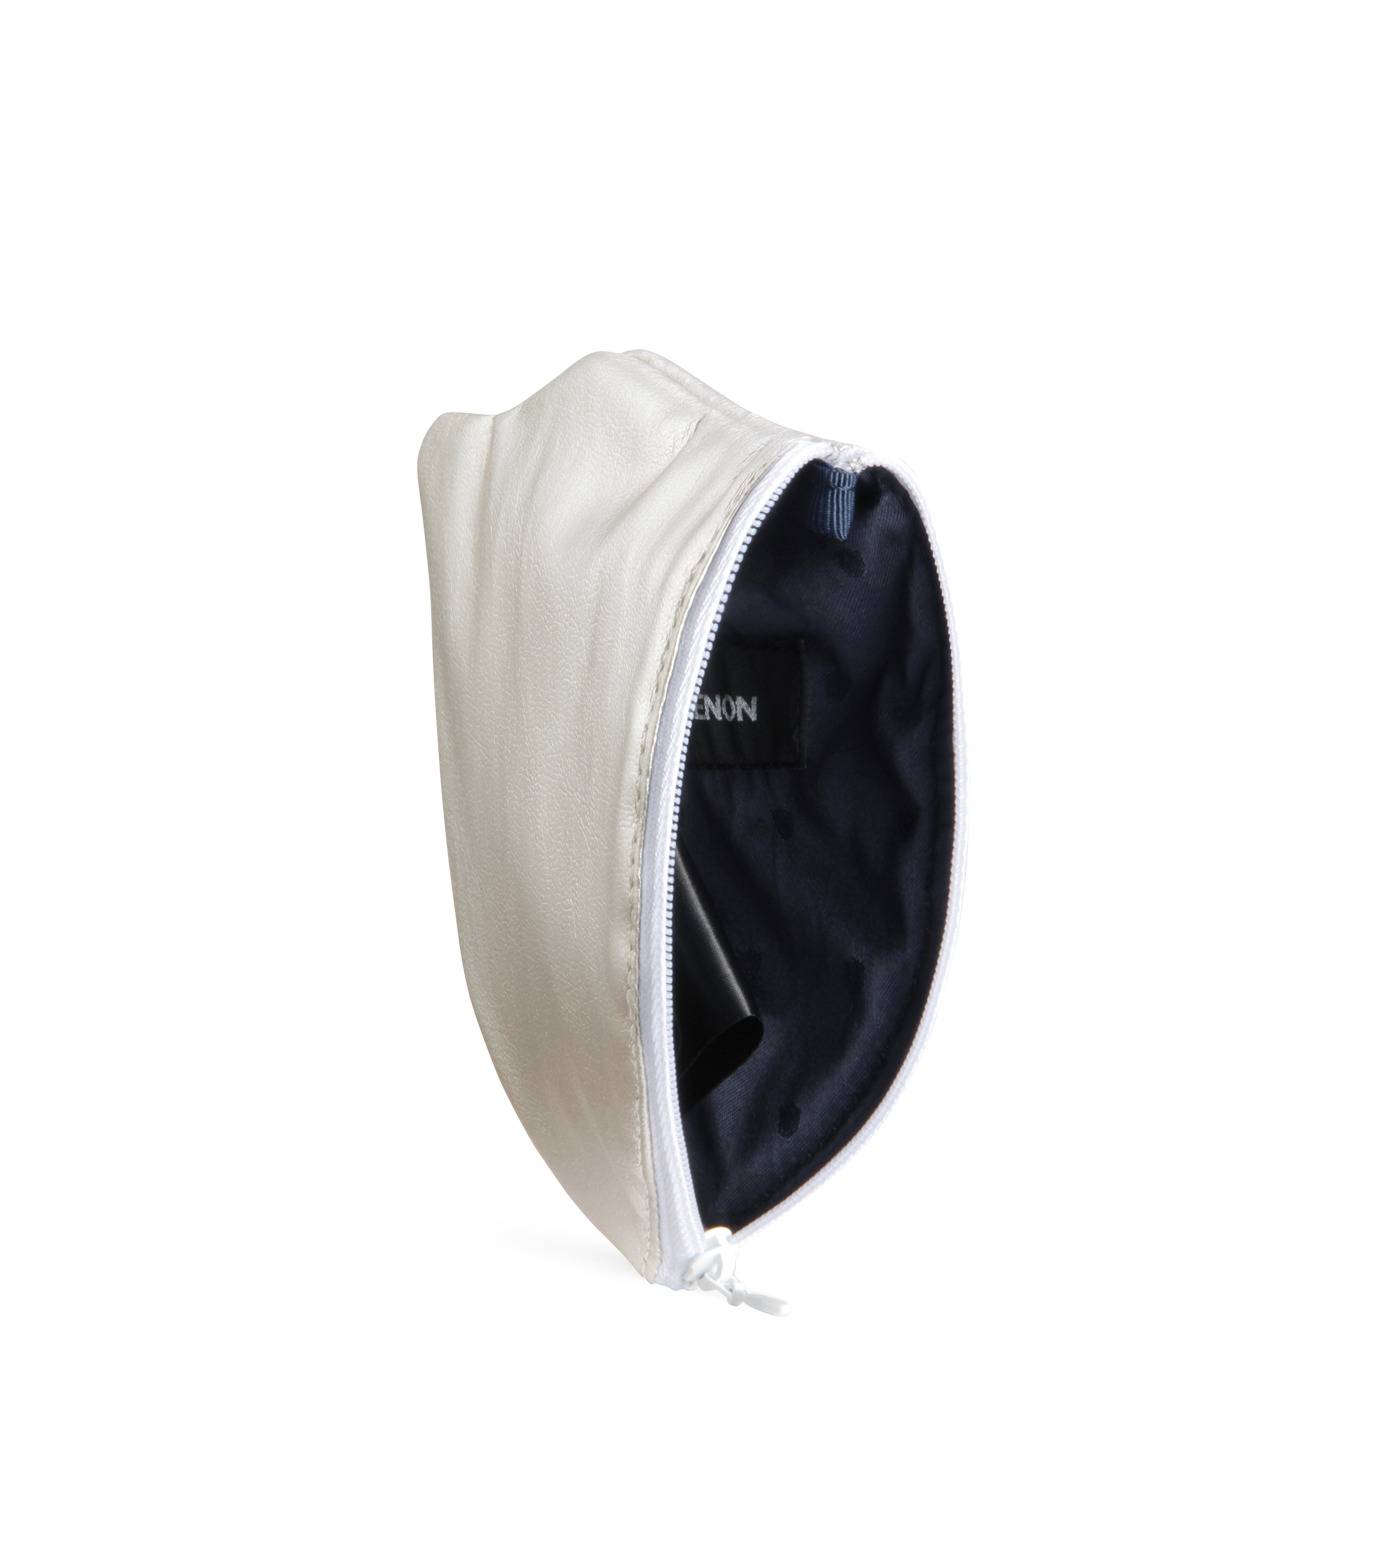 Phenomenon(フェノメノン)のLeather emblem pouch-SILVER(デジタルアクセサリー/digital accesary)-ILLBG-135-1 拡大詳細画像4